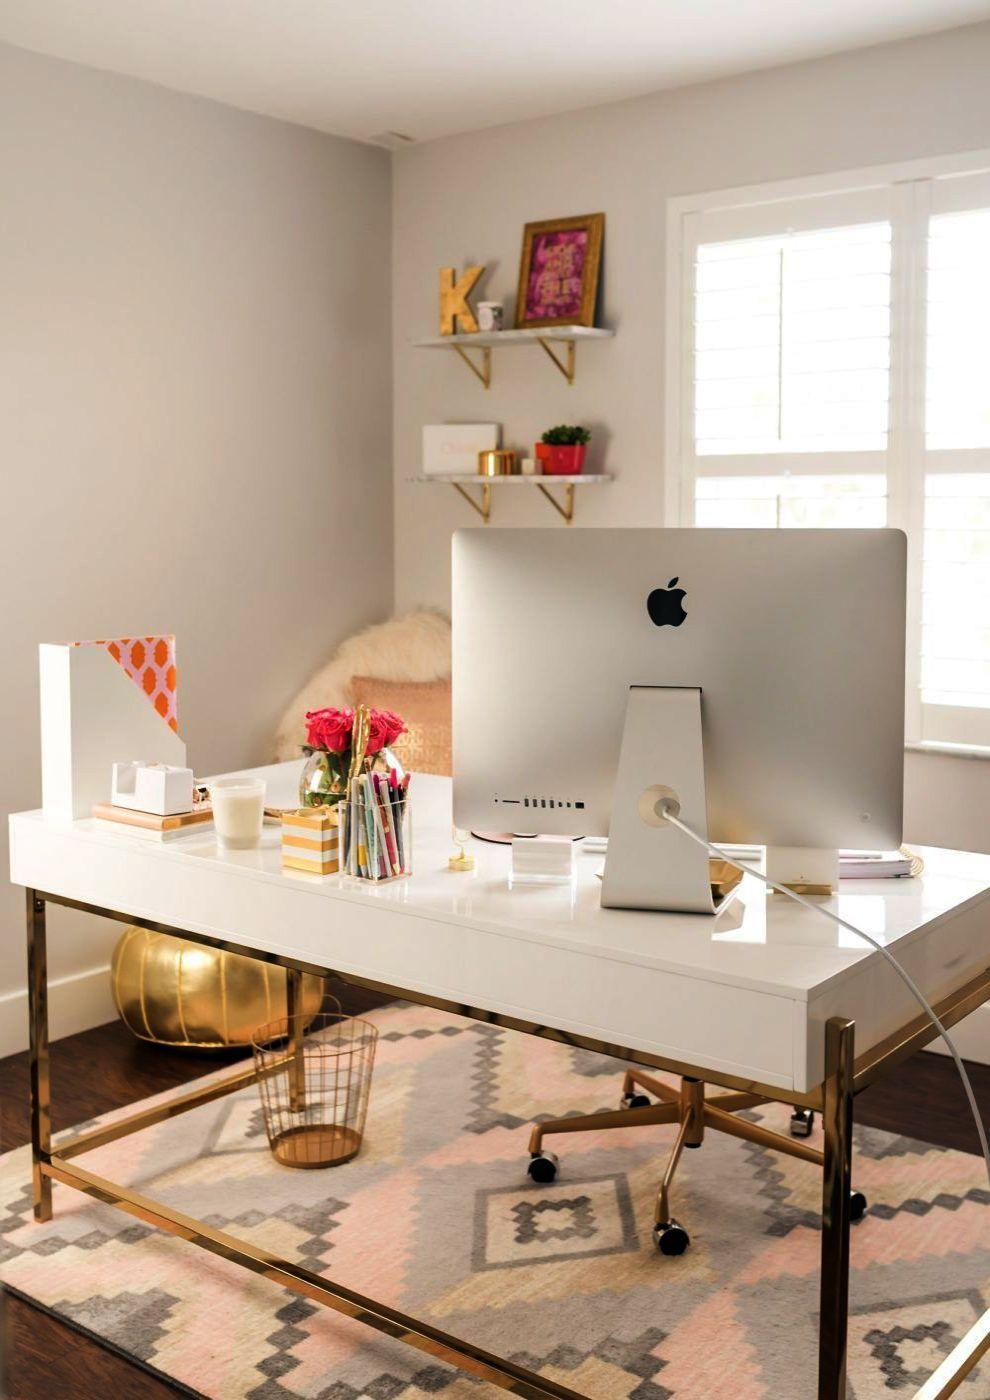 Shabby Chic Interior Design Pdf Shabby Chic Home Decor Amazon